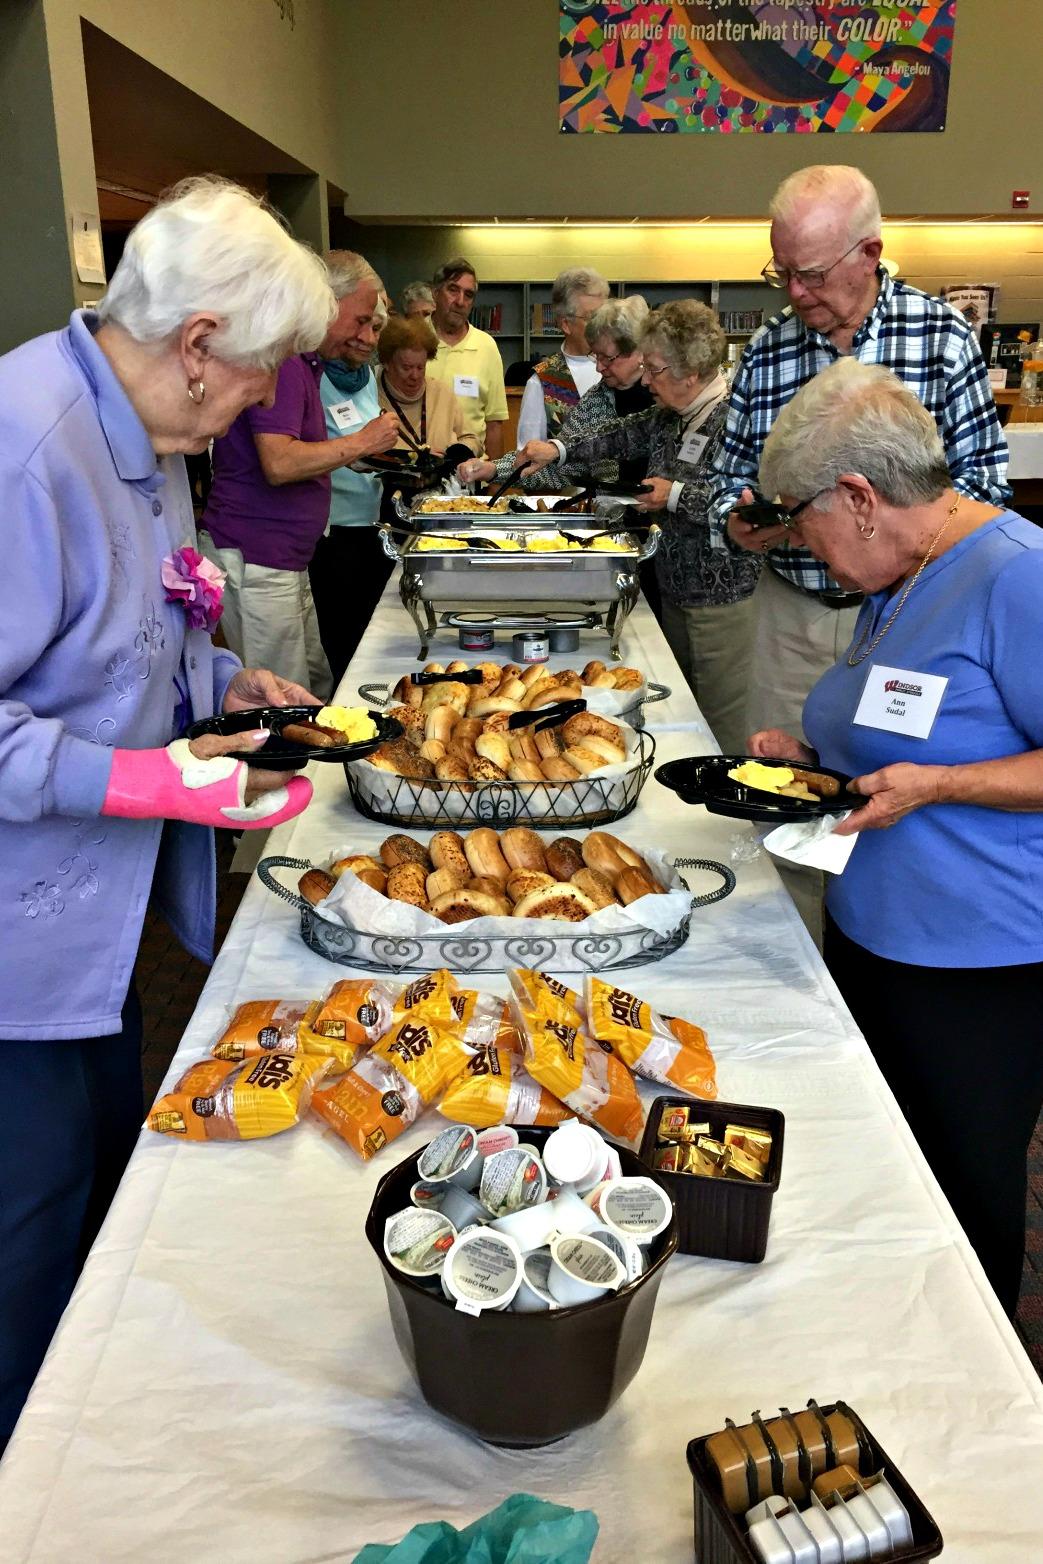 Superintendent's Annual Senior Citizen Breakfast